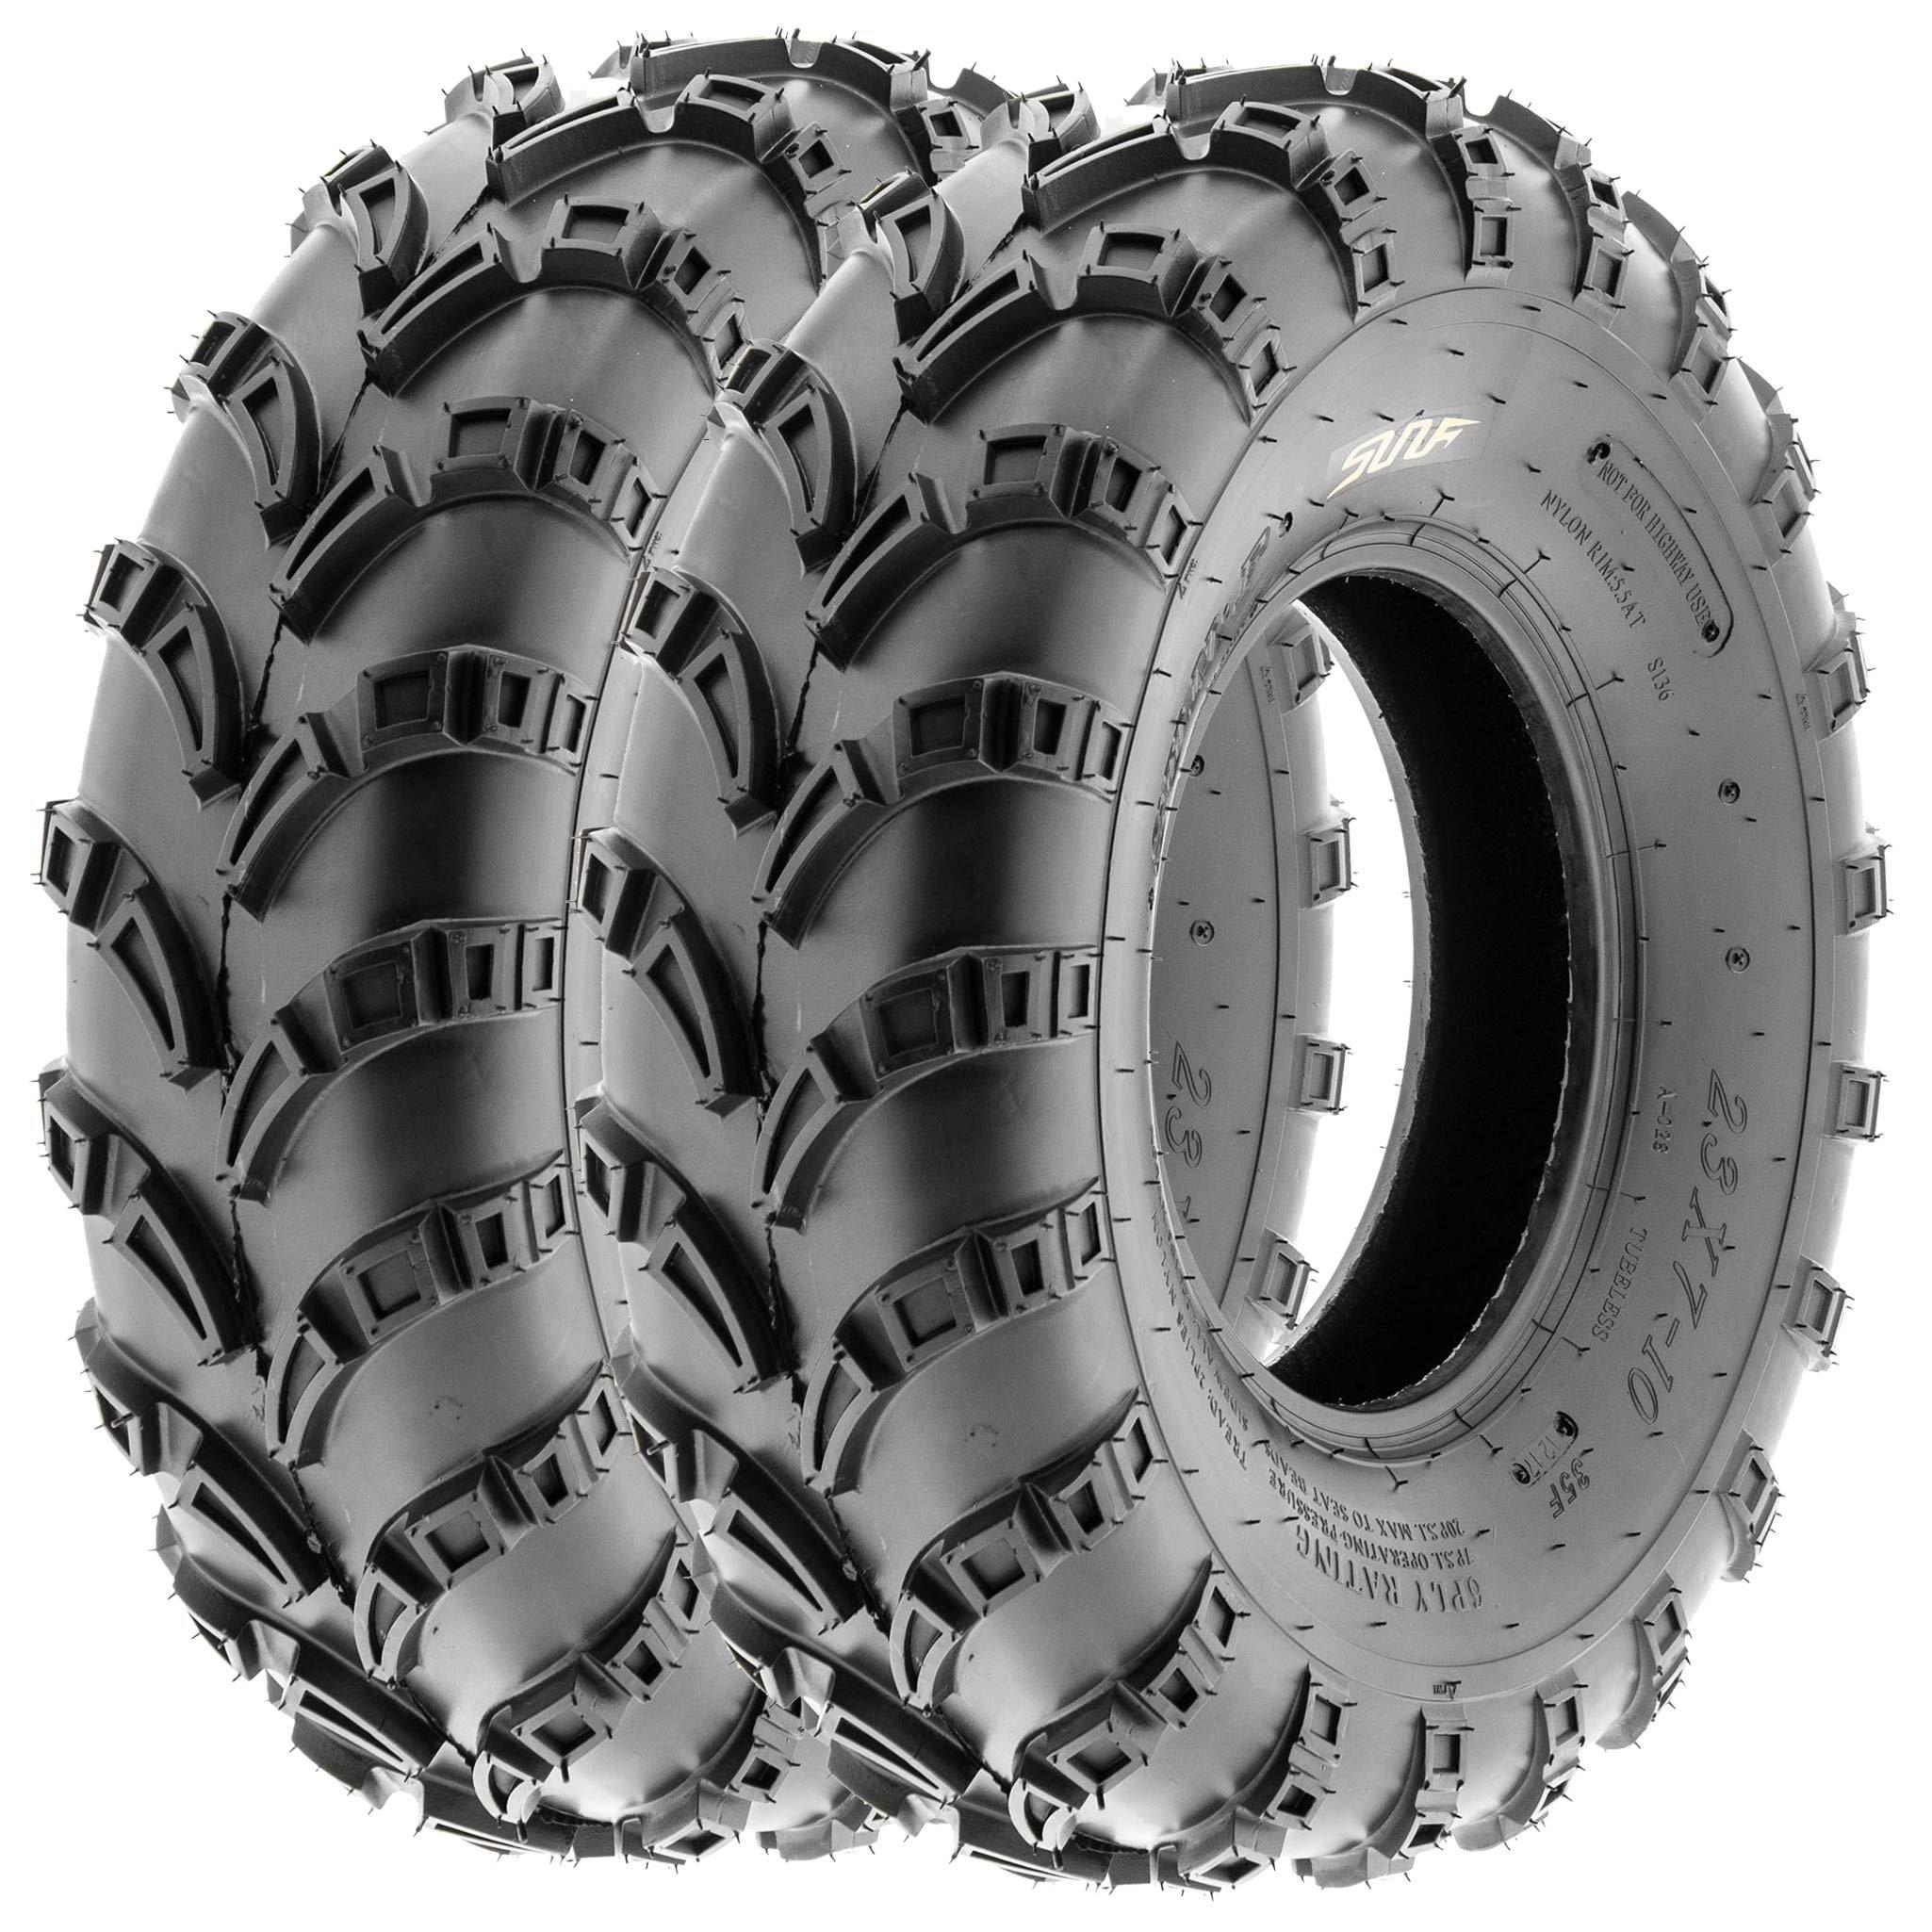 SunF 23x7-10 23x7x10 ATV UTV Trail Race Replacement 6 PR Tubeless Tires A028, [Set of 2]